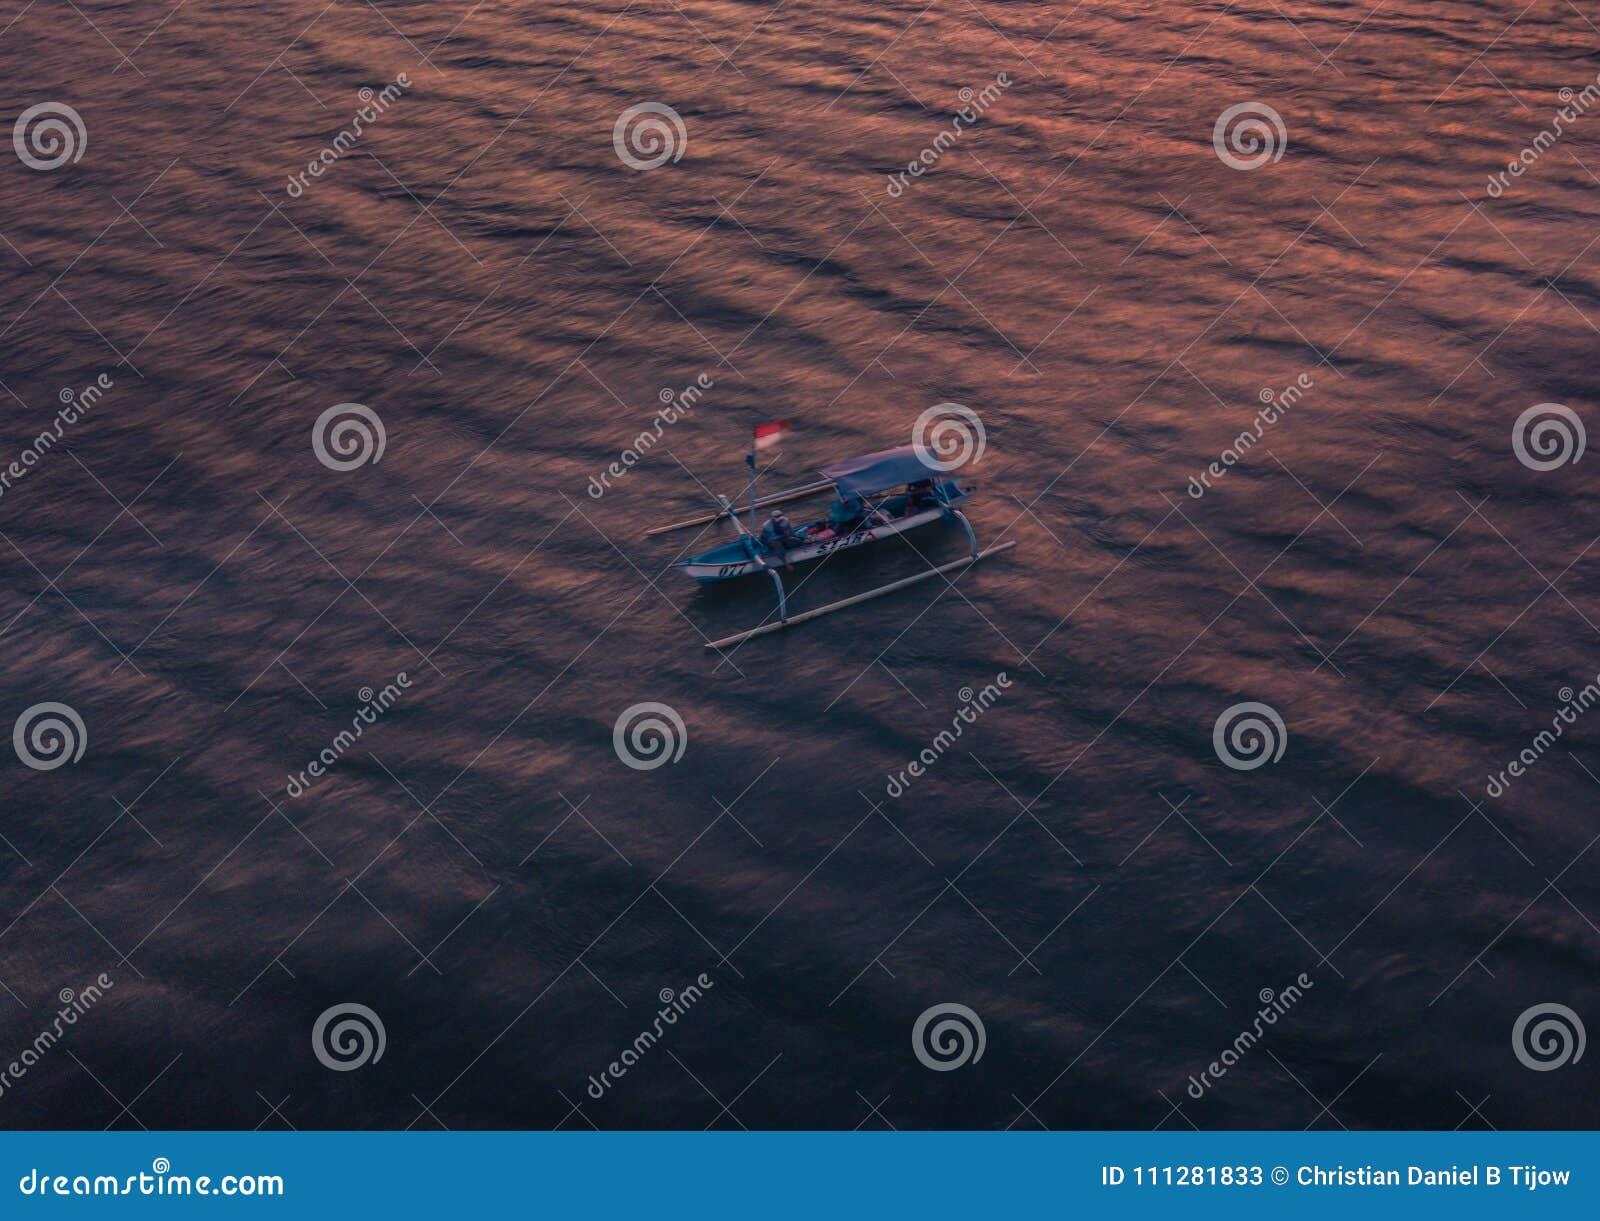 BALI - INDONESIA JANUARY 2018 - Fisherman on small boat